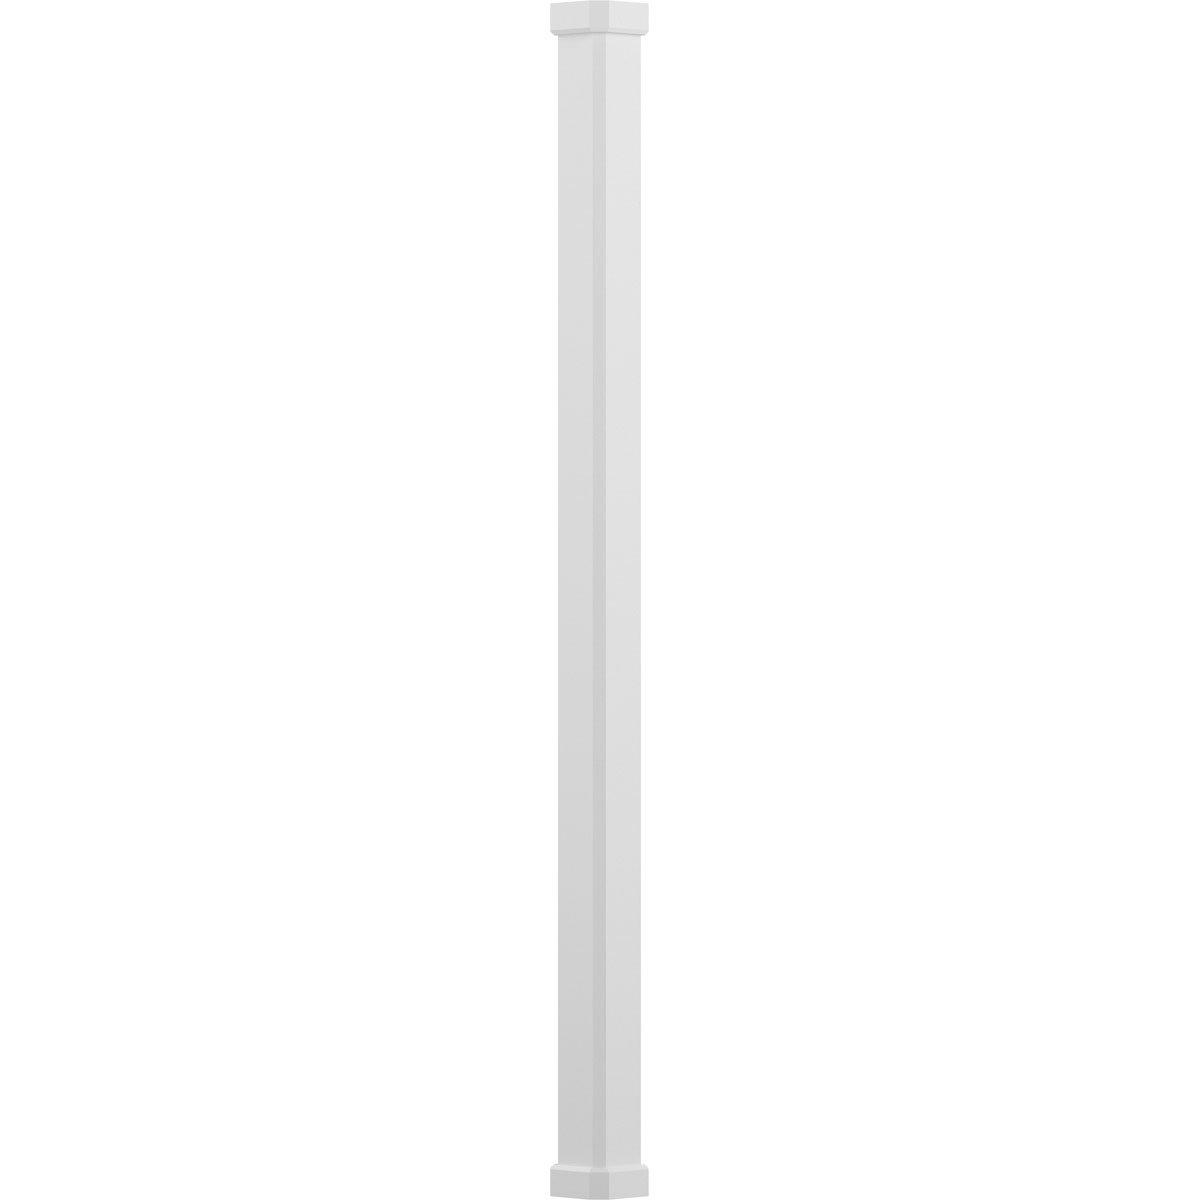 AFCO EA0608ENPSACRCR 6'' x 8' Endura-Aluminum Craftsman Style Column, Square Shaft (Load-Bearing 20,000 lbs), Non-Tapered, Textured White Finish w/ Capital & Base